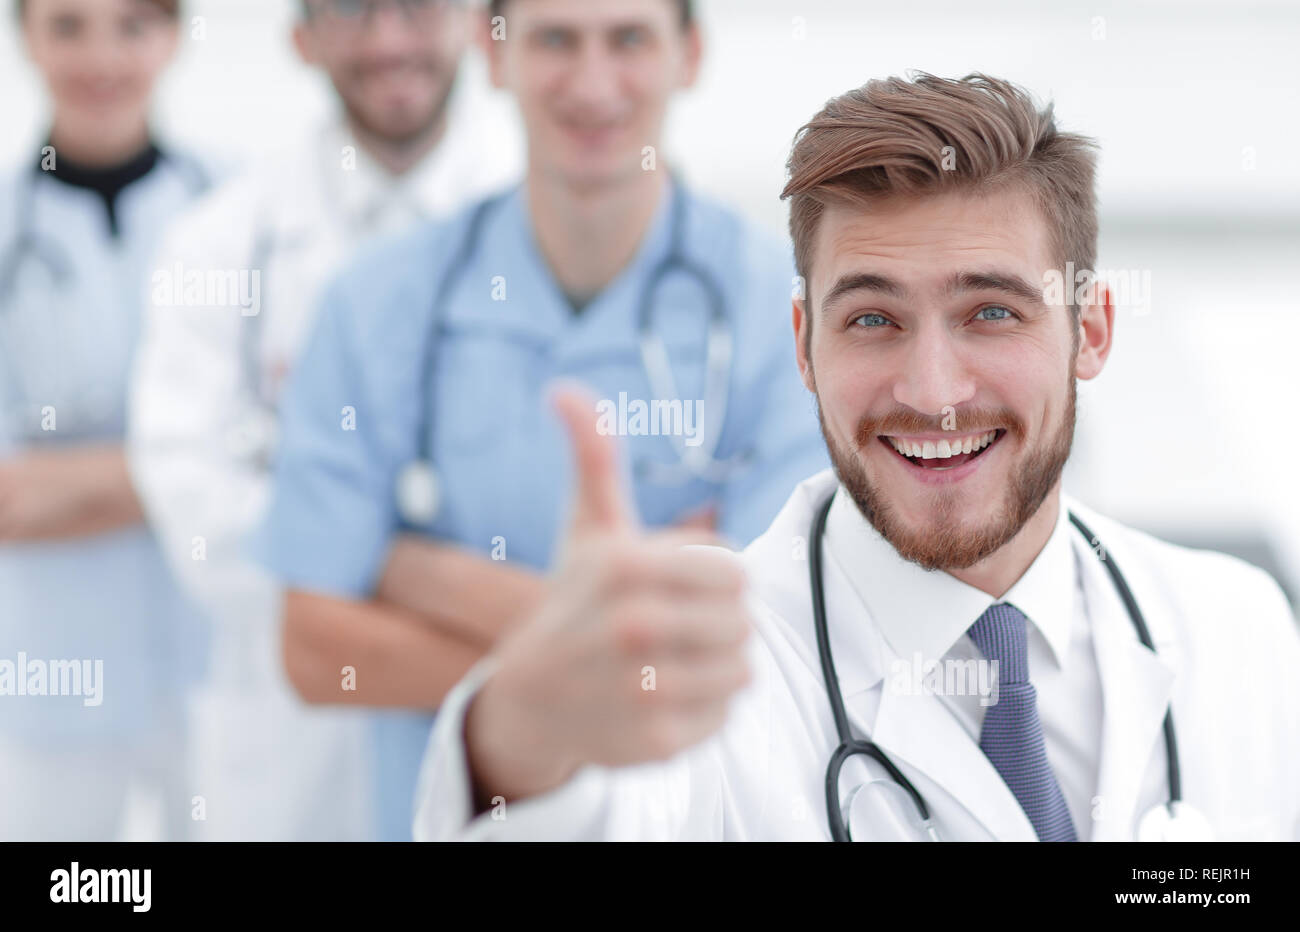 Médico experimentado mostrando pulgar arriba Imagen De Stock